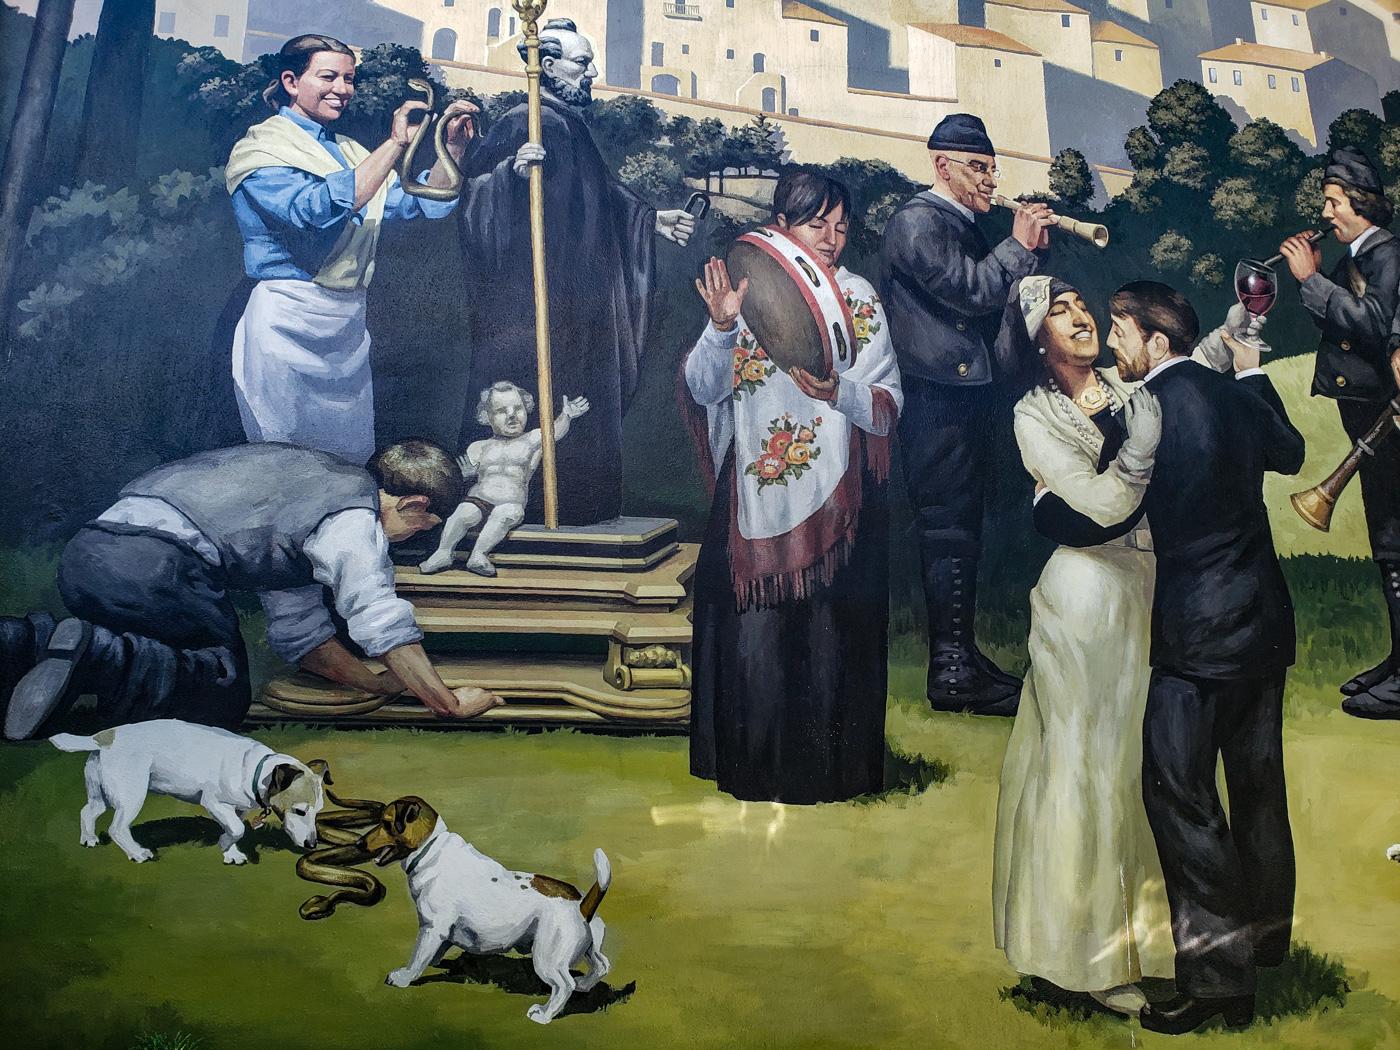 Mural honoring Abruzzo at Le Virtù by Brian Senft